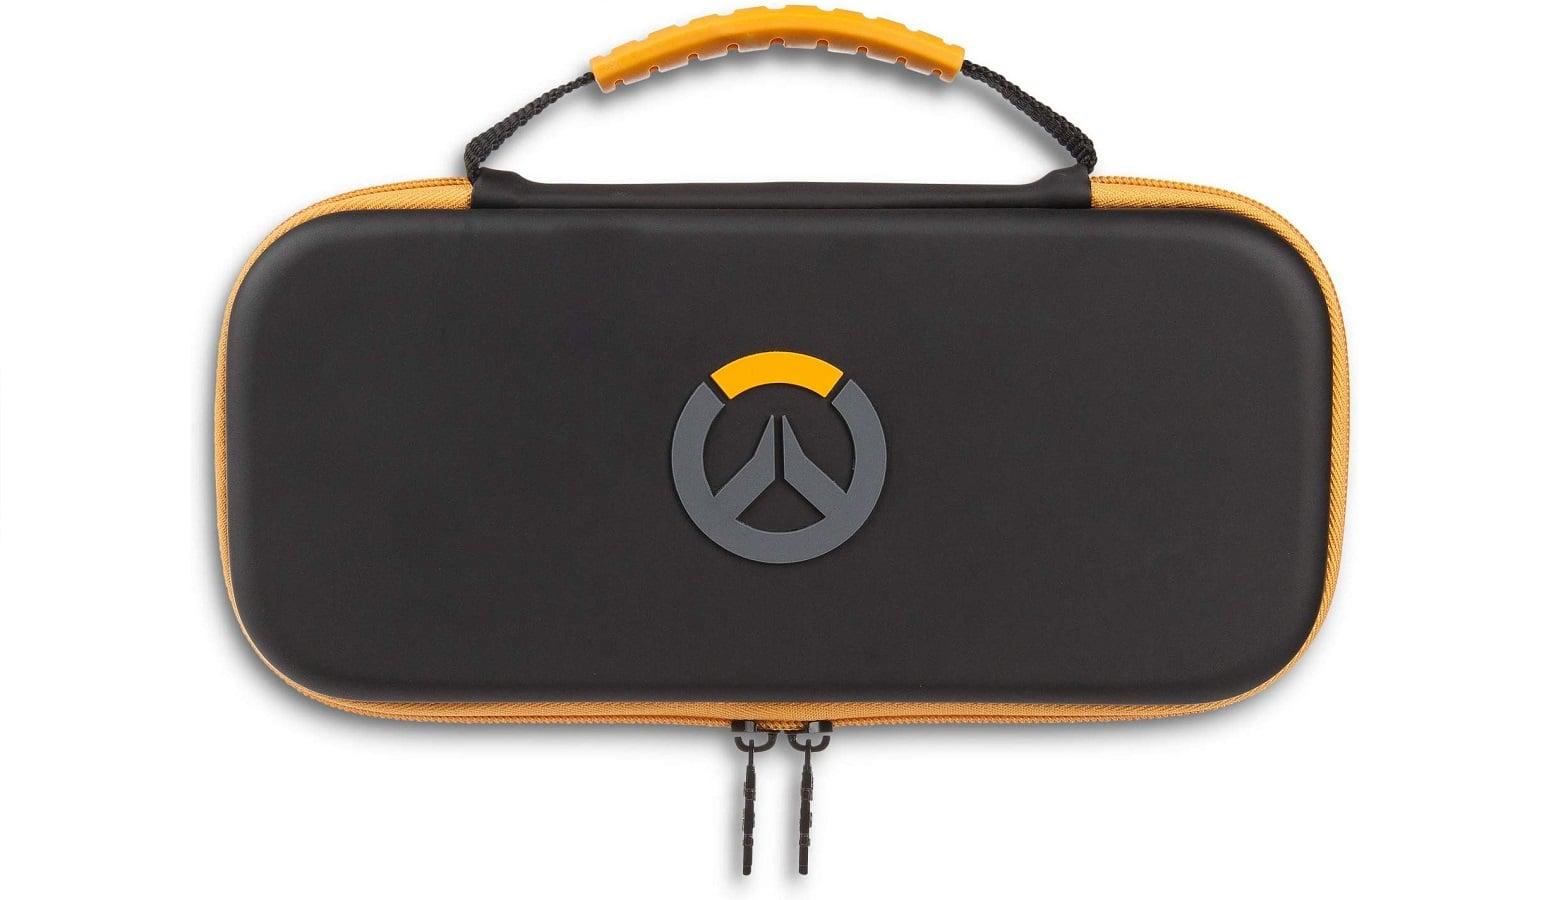 overwatch nintendo switch case